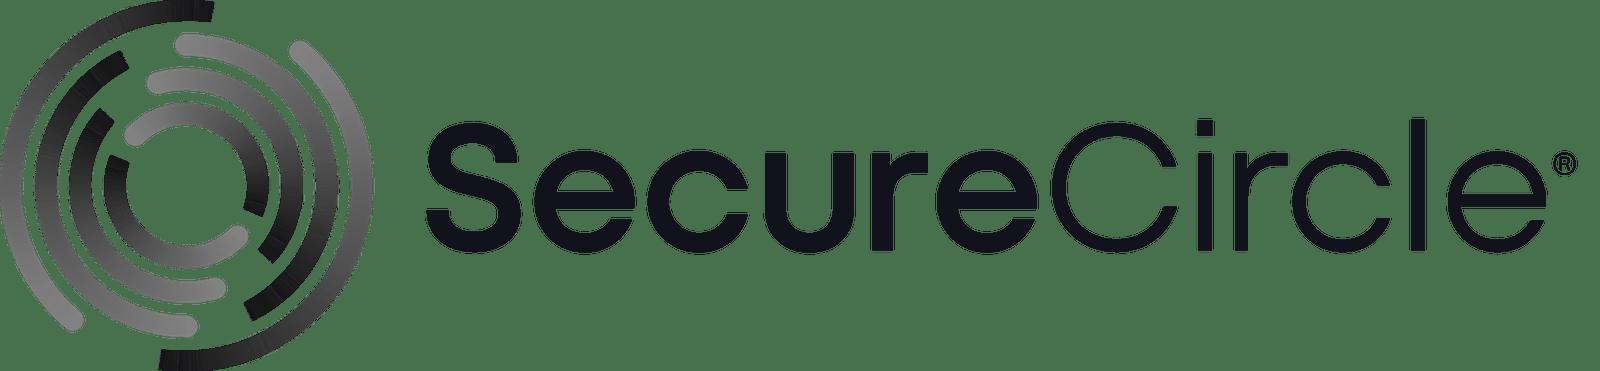 SecureCircle primary greyscale logo